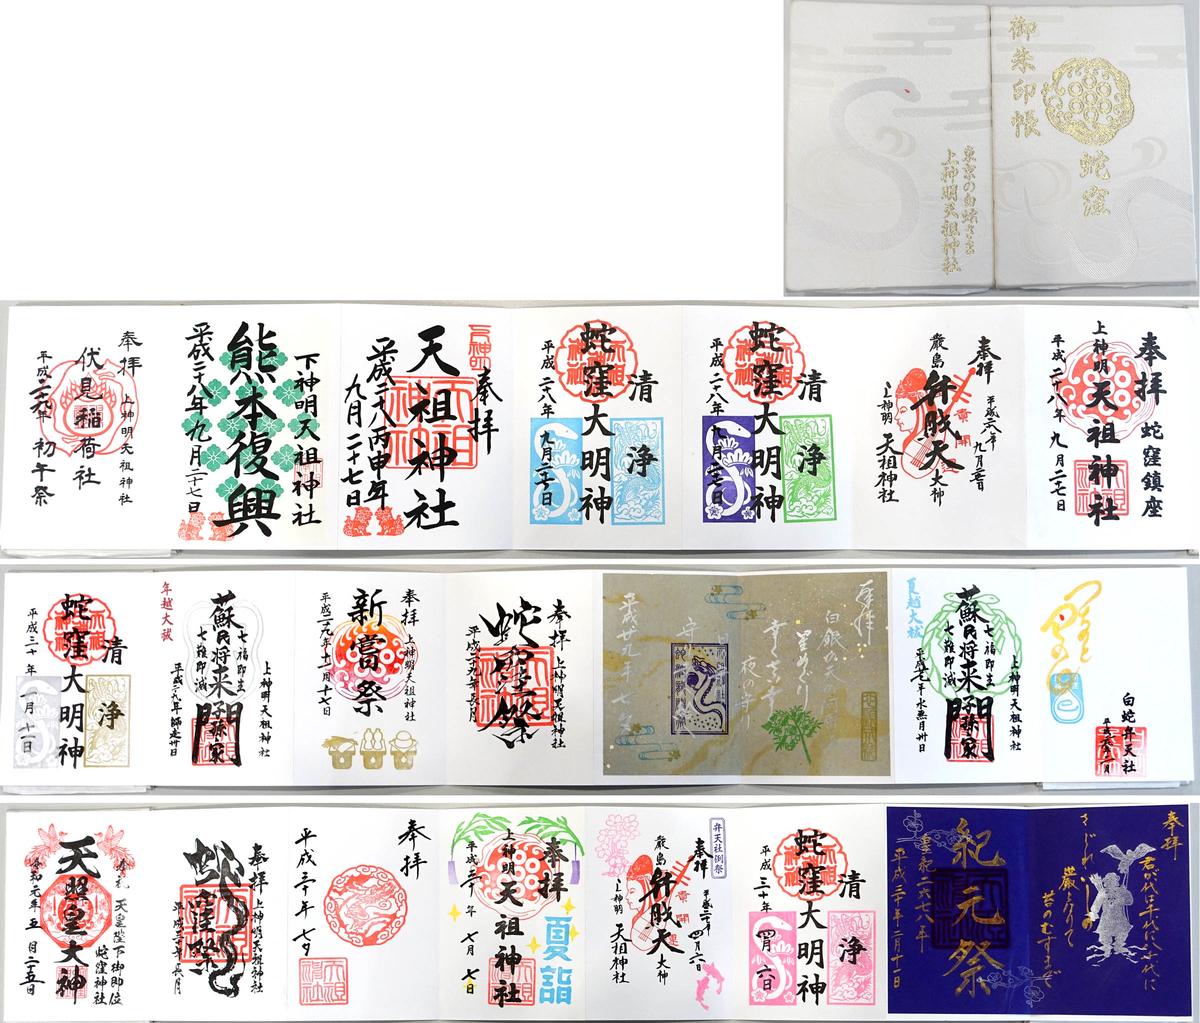 f:id:Mayugeloki:20200606135825j:plain